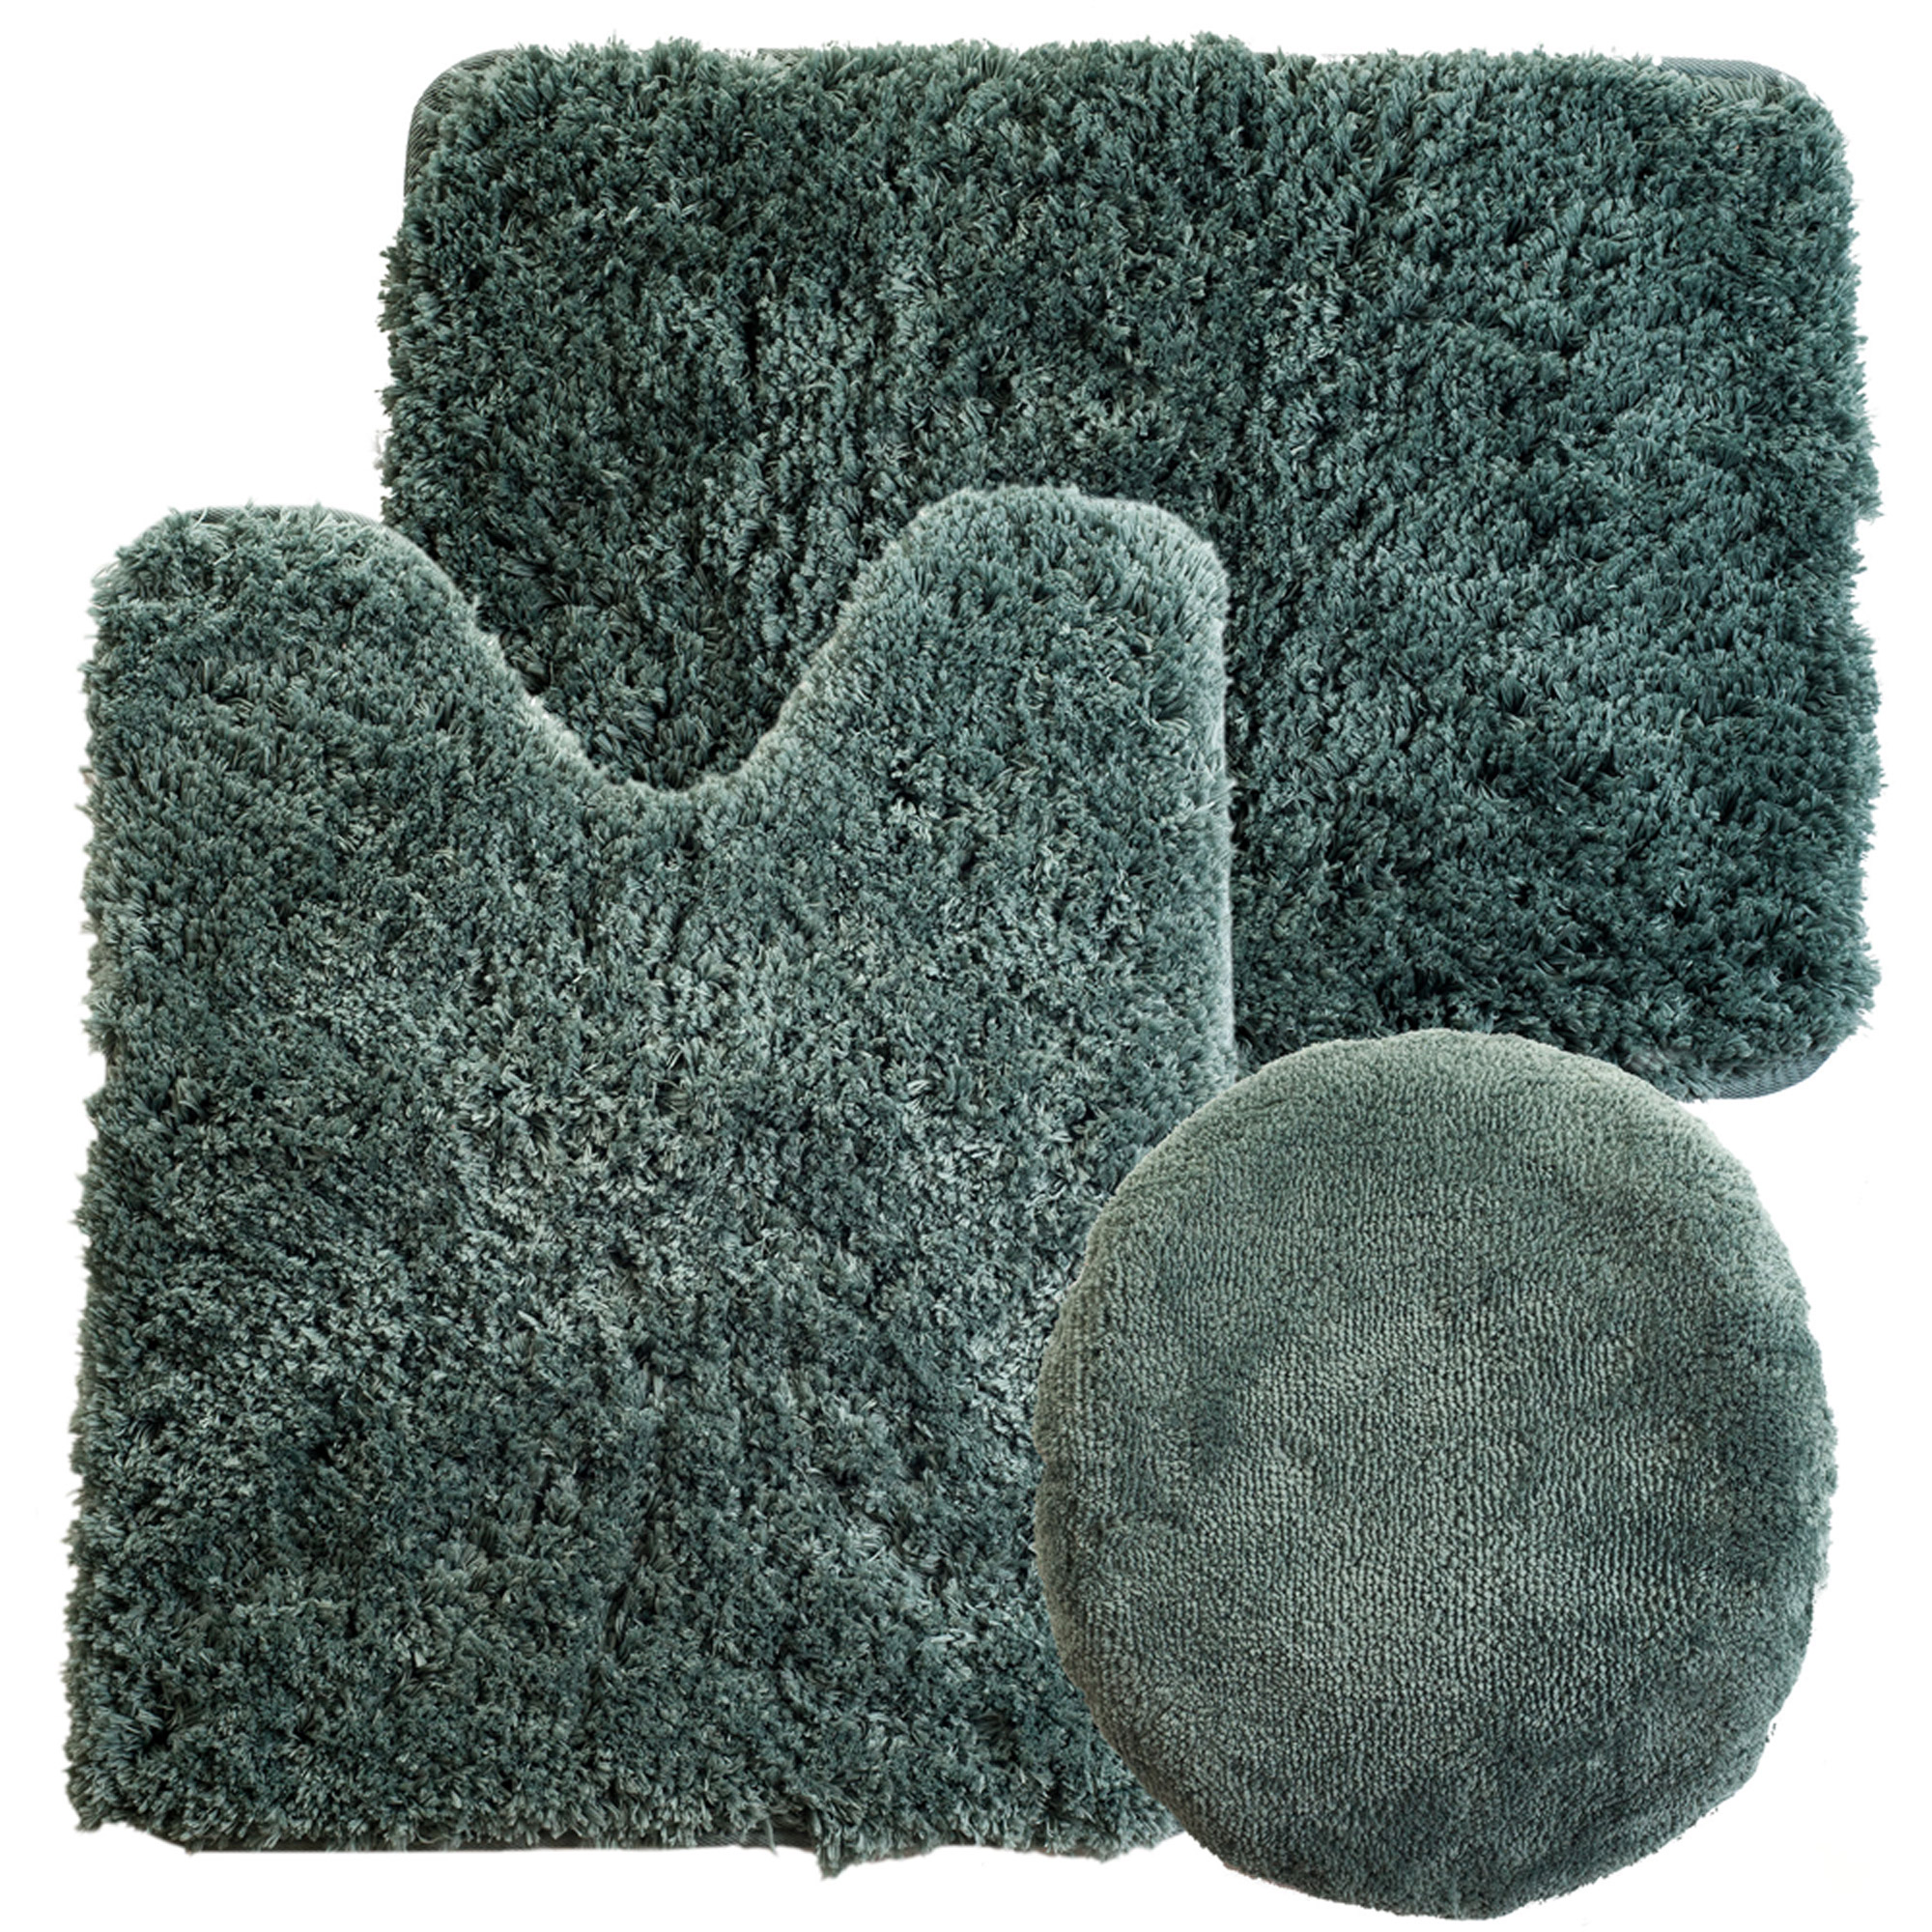 Plush Bathroom Rugs Lavish Home 3 Piece Super Plush Non Slip Bath Mat Rug Set